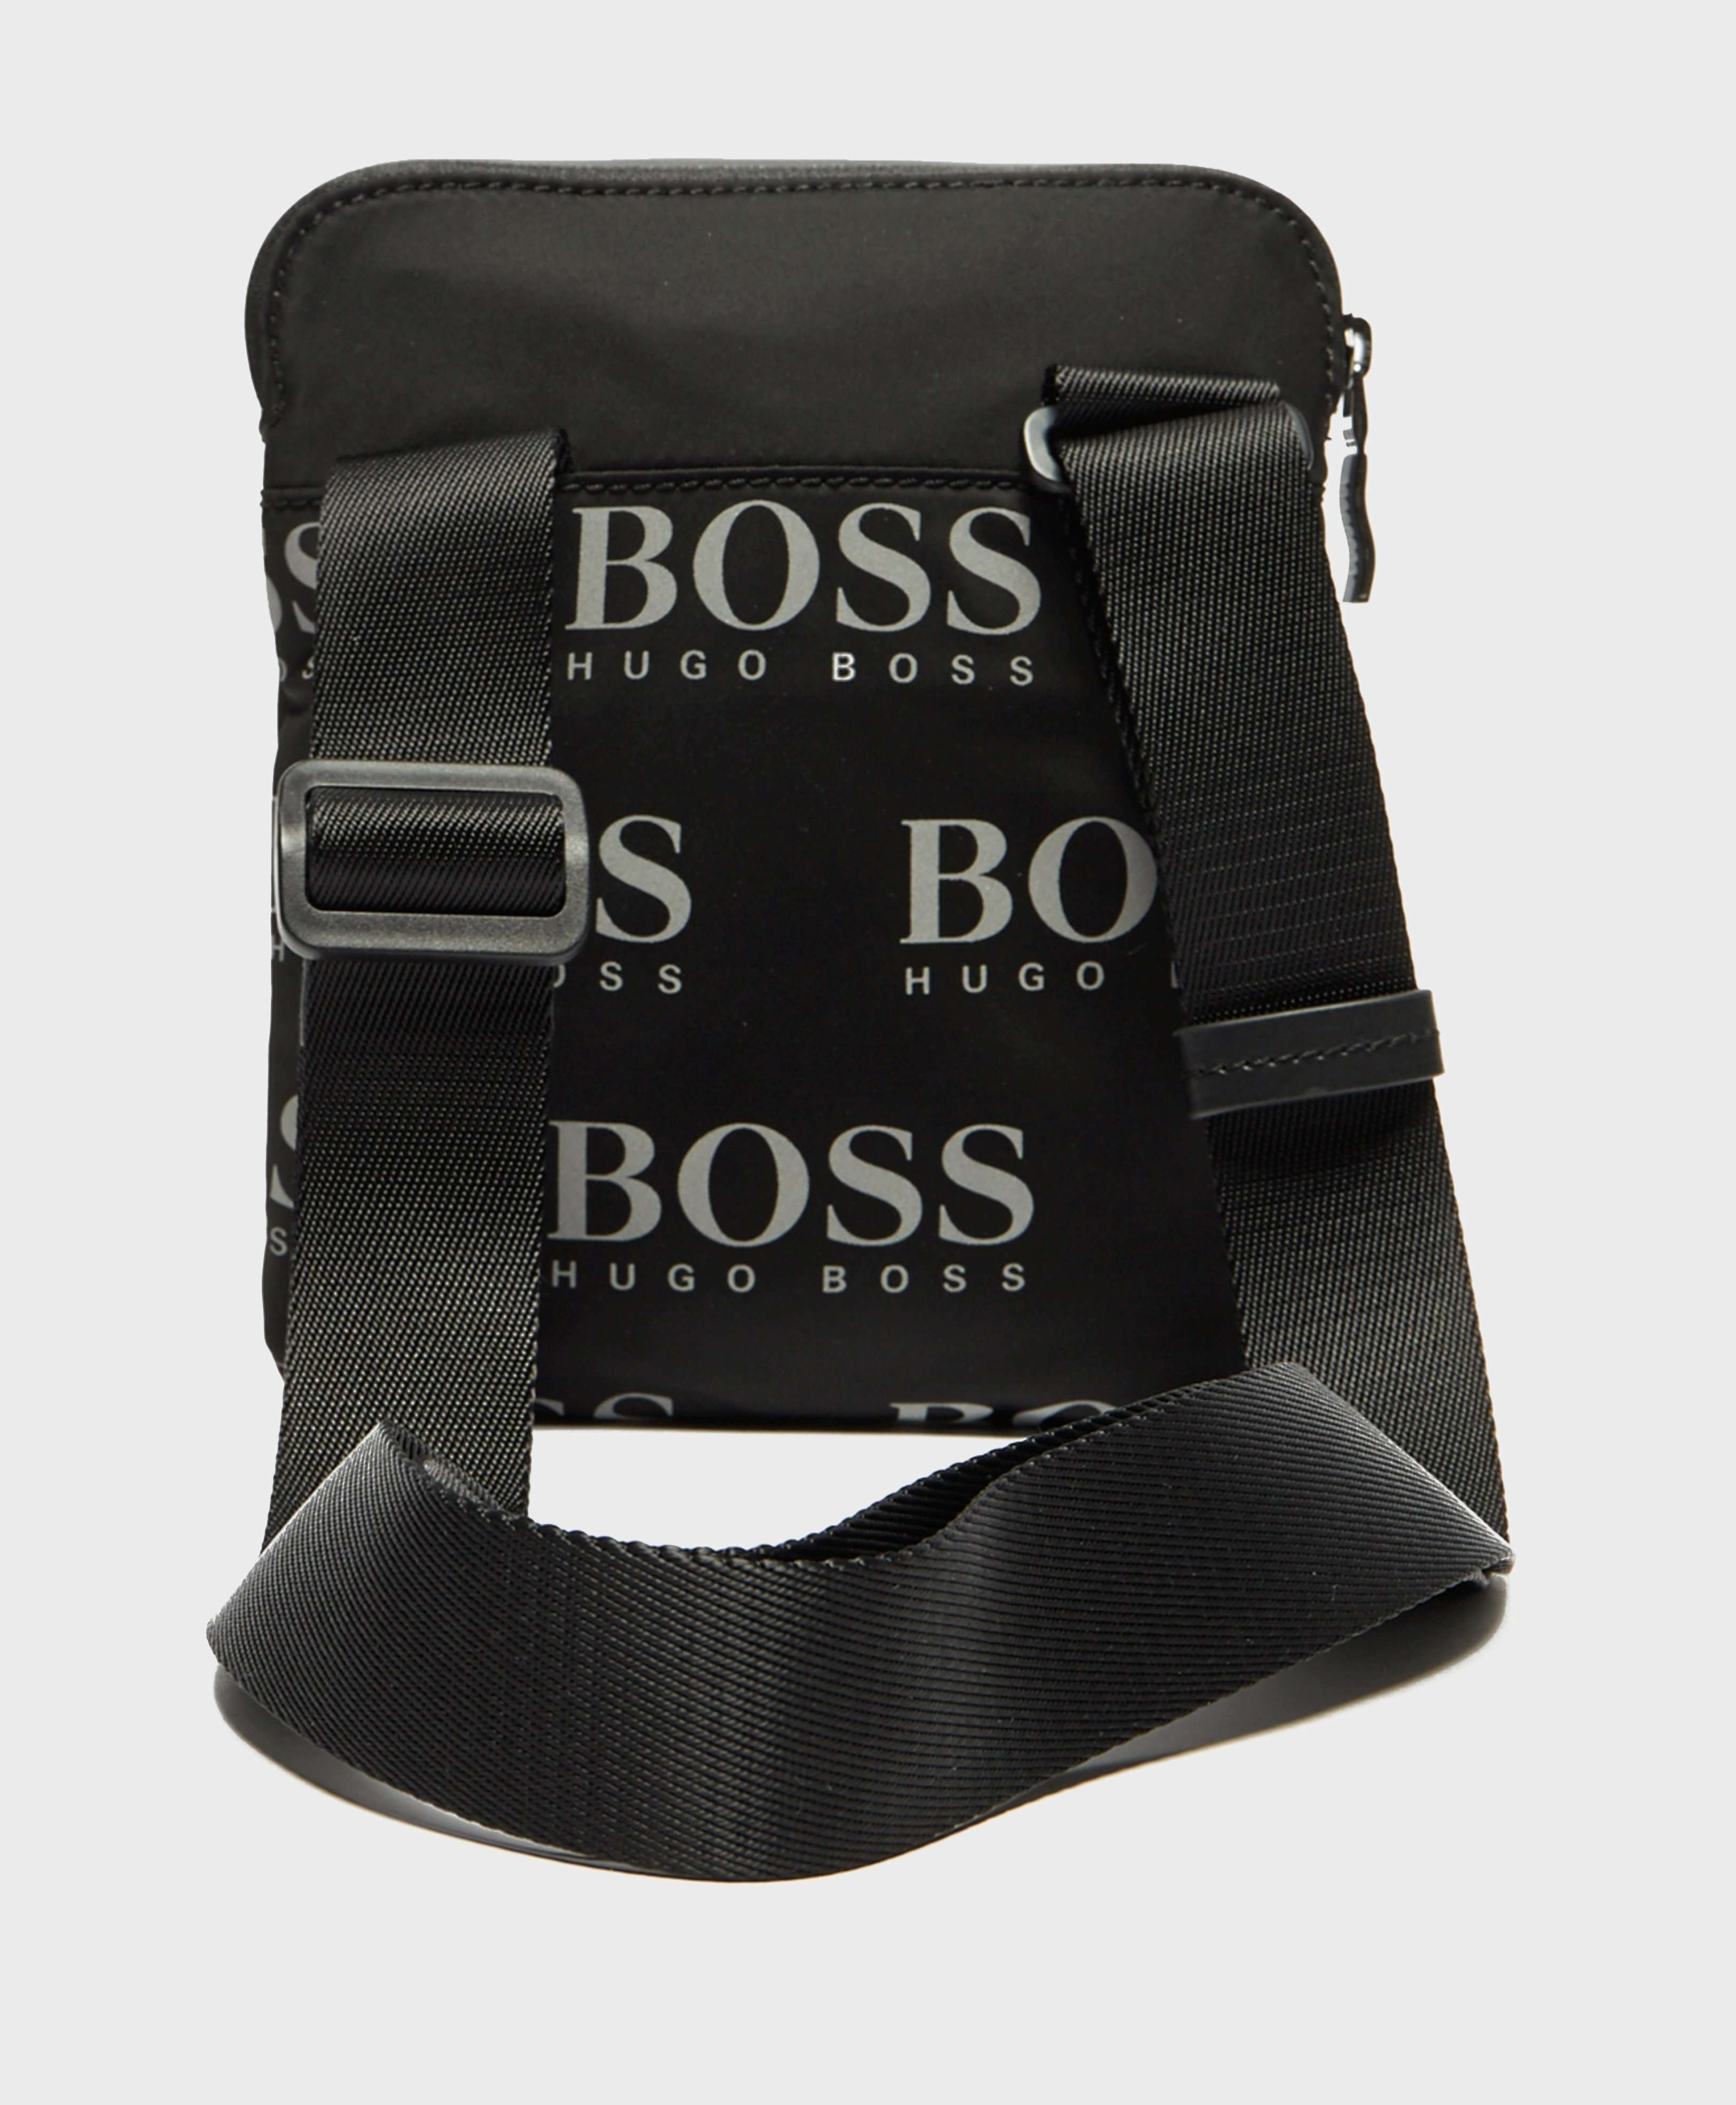 BOSS Iconic Print Small Item Bag